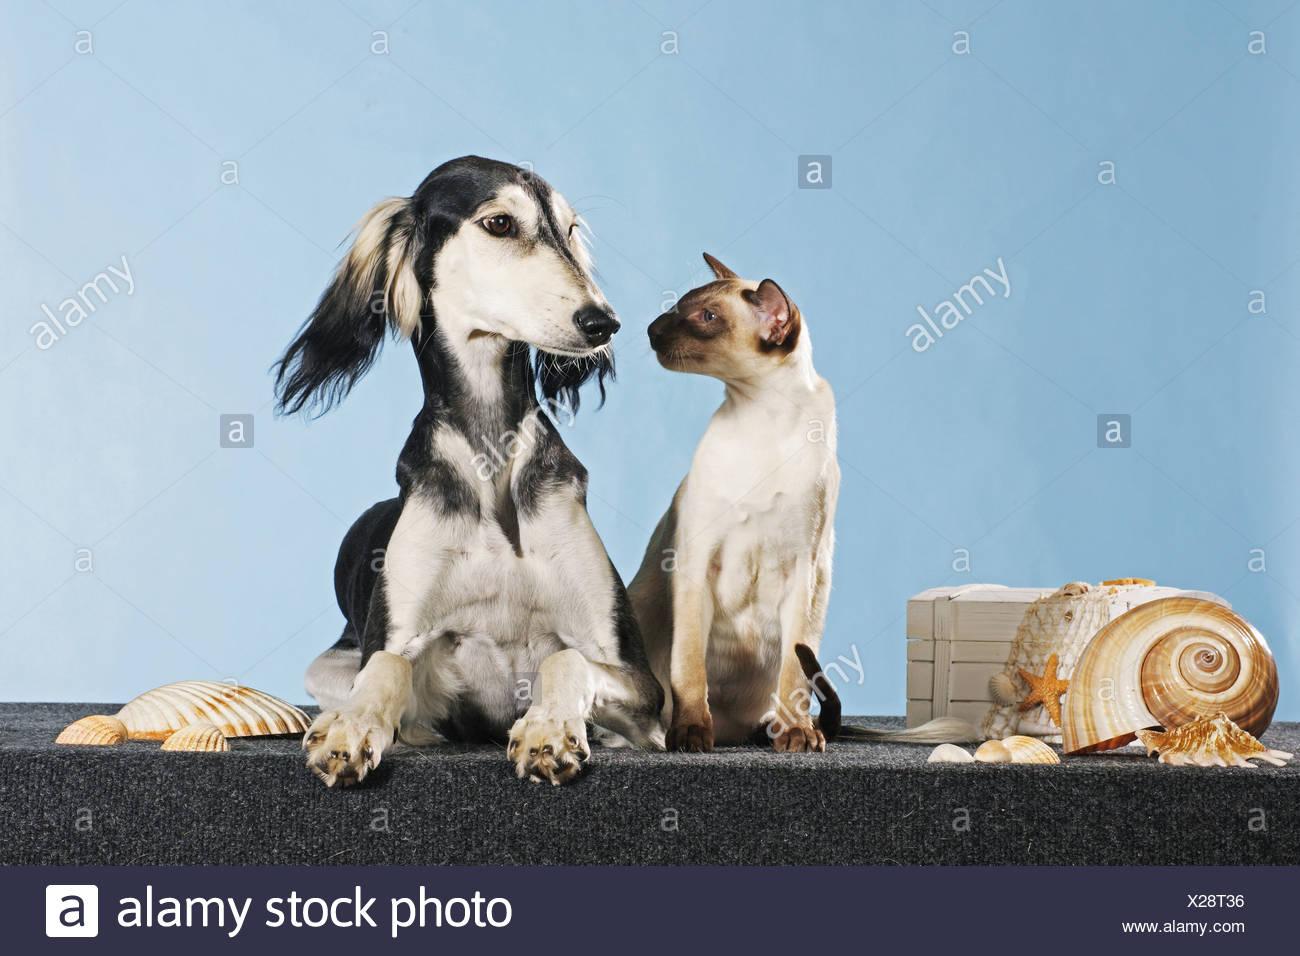 animal friendship: Saluki dog and Siamese cat Stock Photo